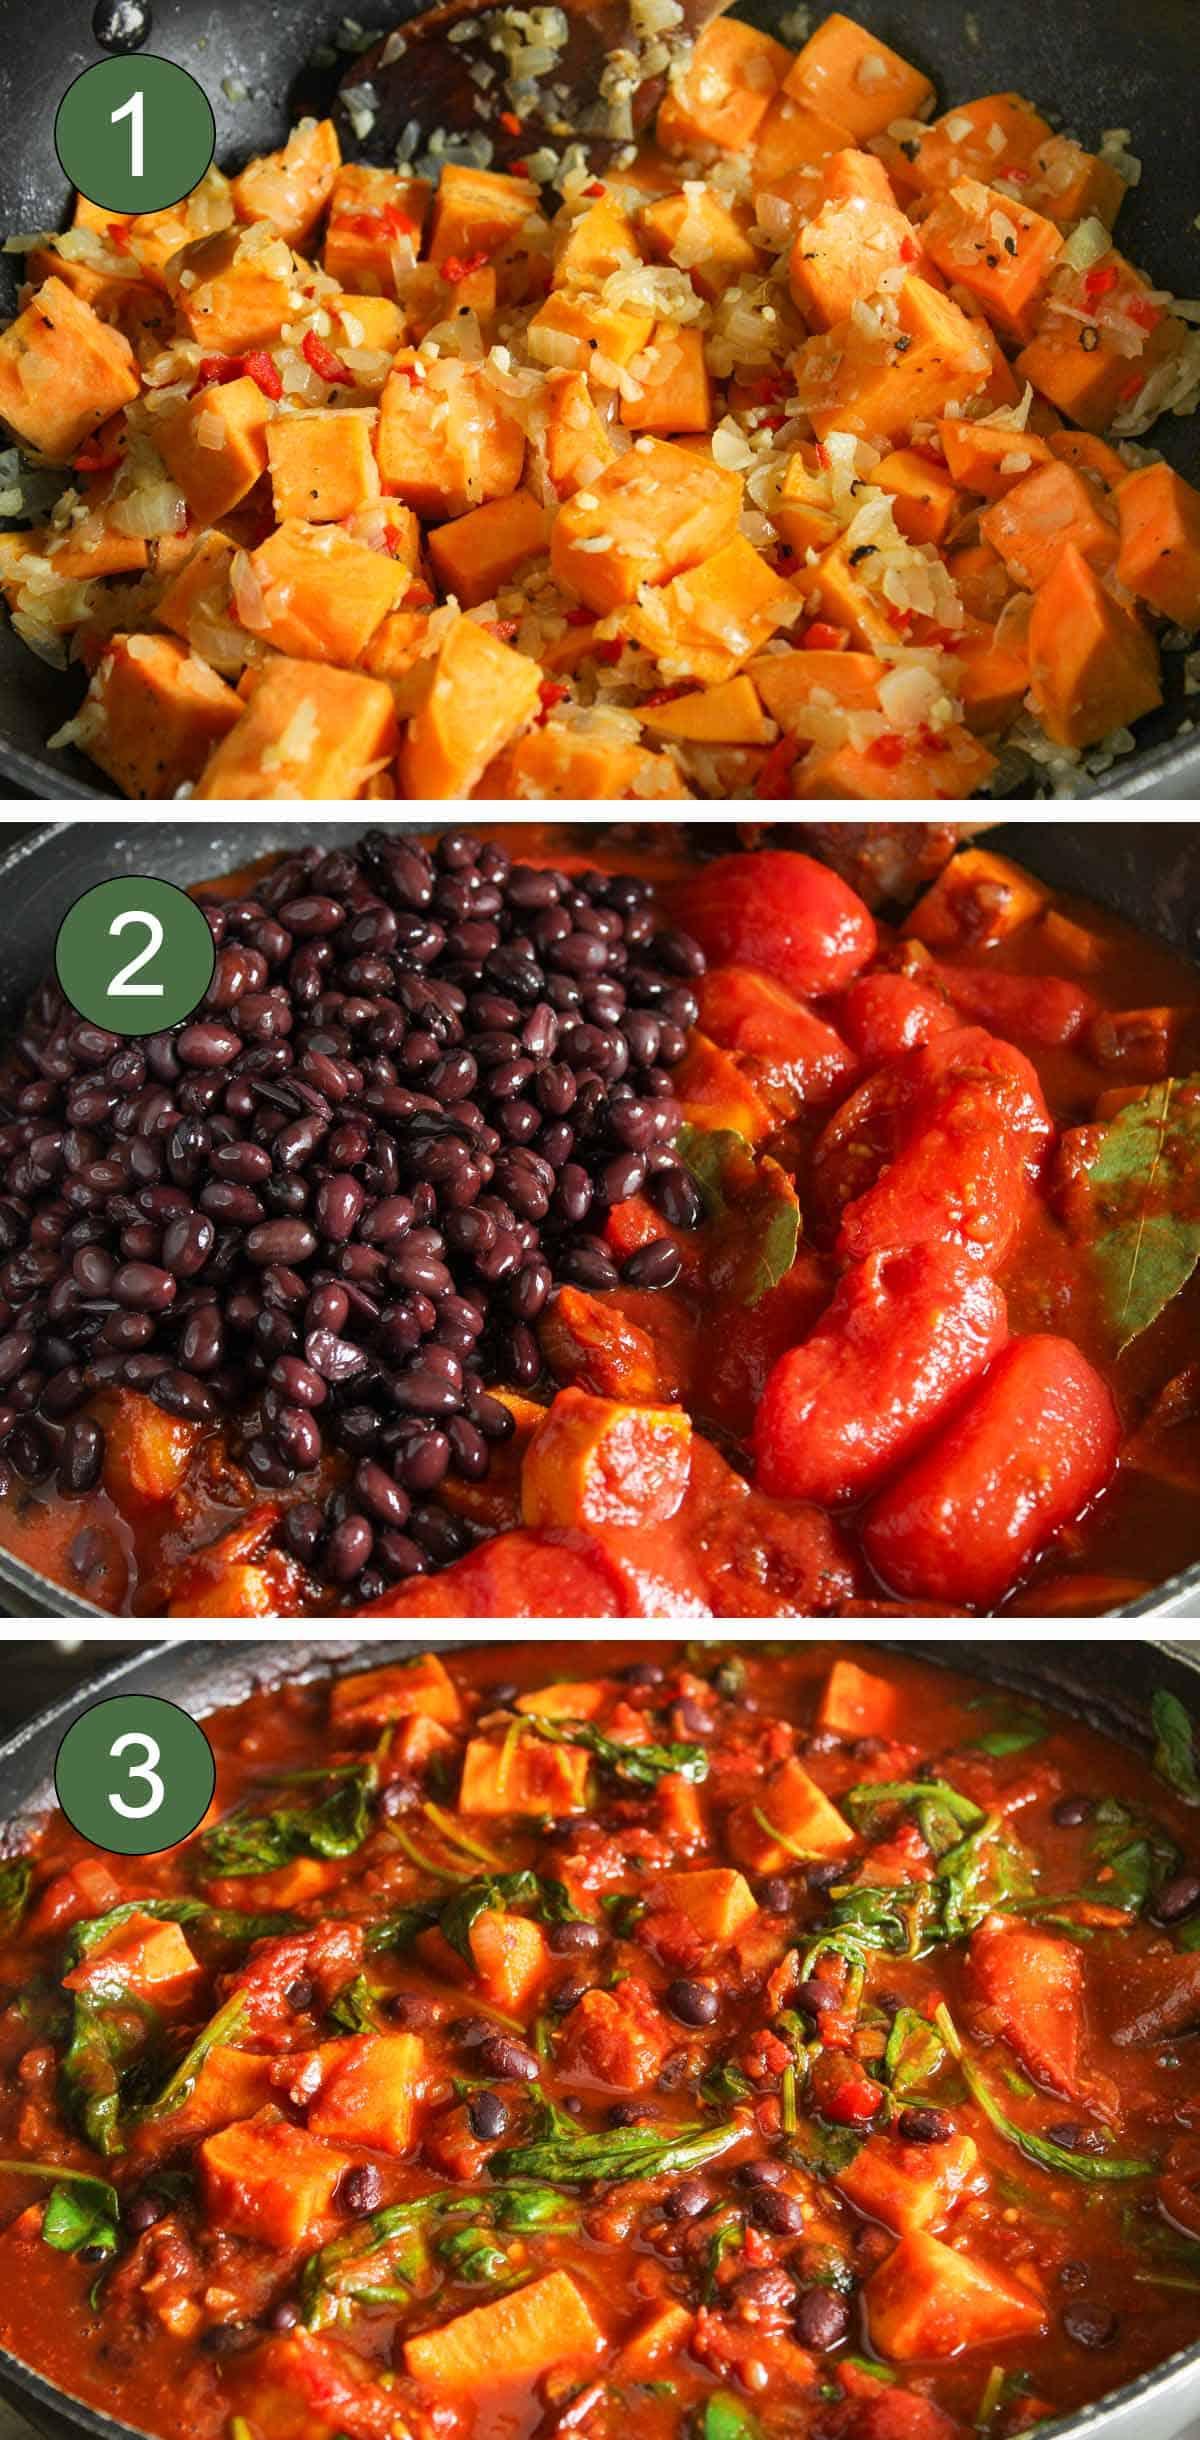 Cooking Process Shots Showing How to Make Sweet Potato Black Bean Chili